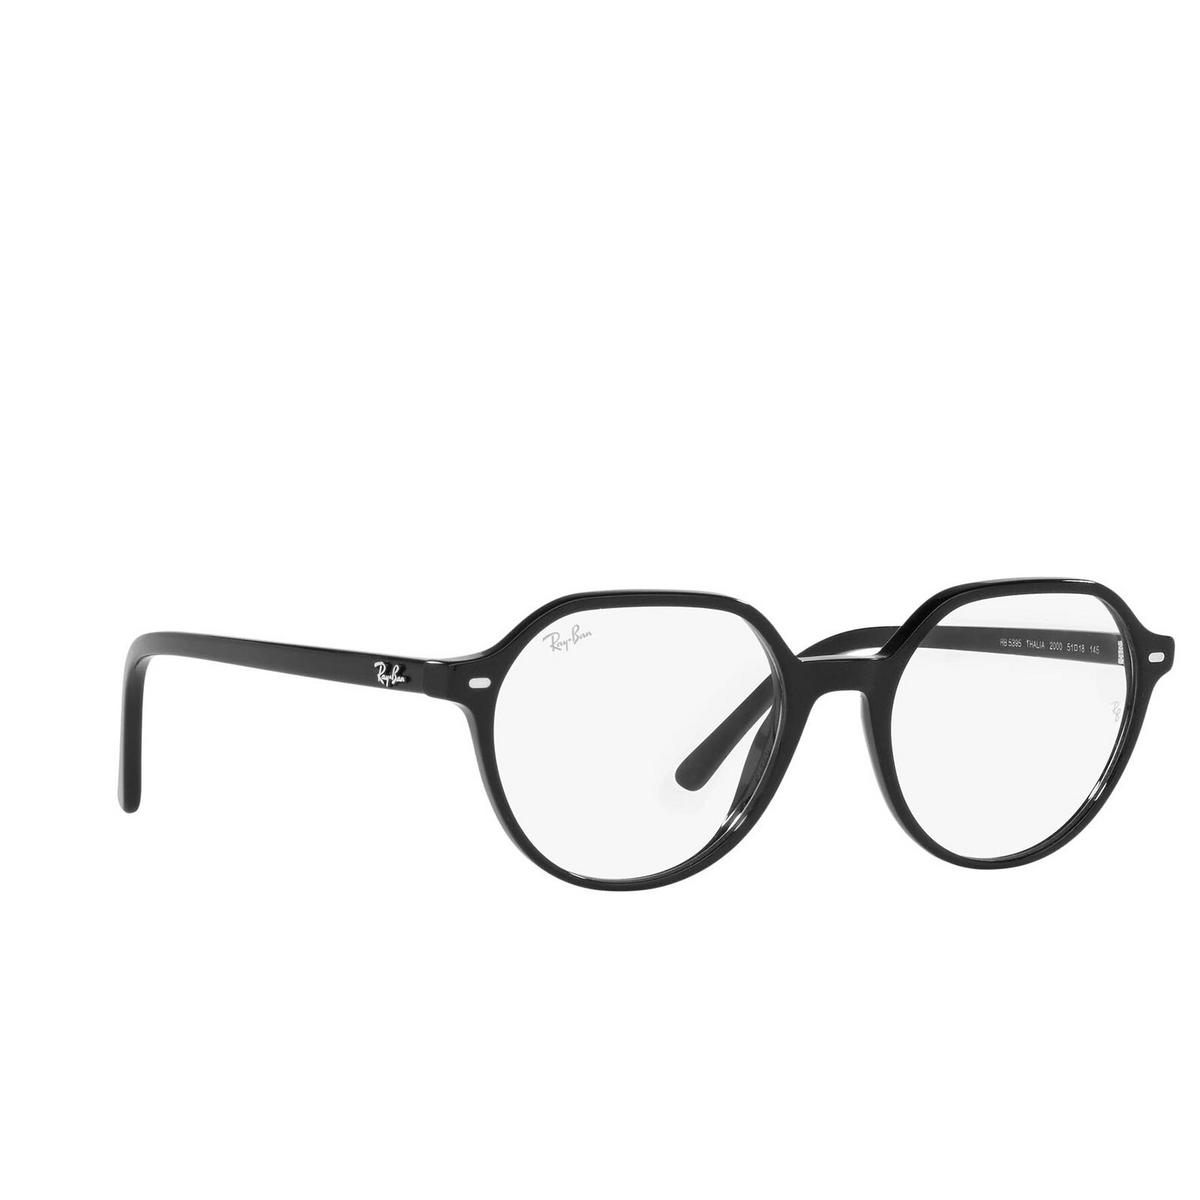 Ray-Ban® Irregular Eyeglasses: Thalia RX5395 color Black 2000.